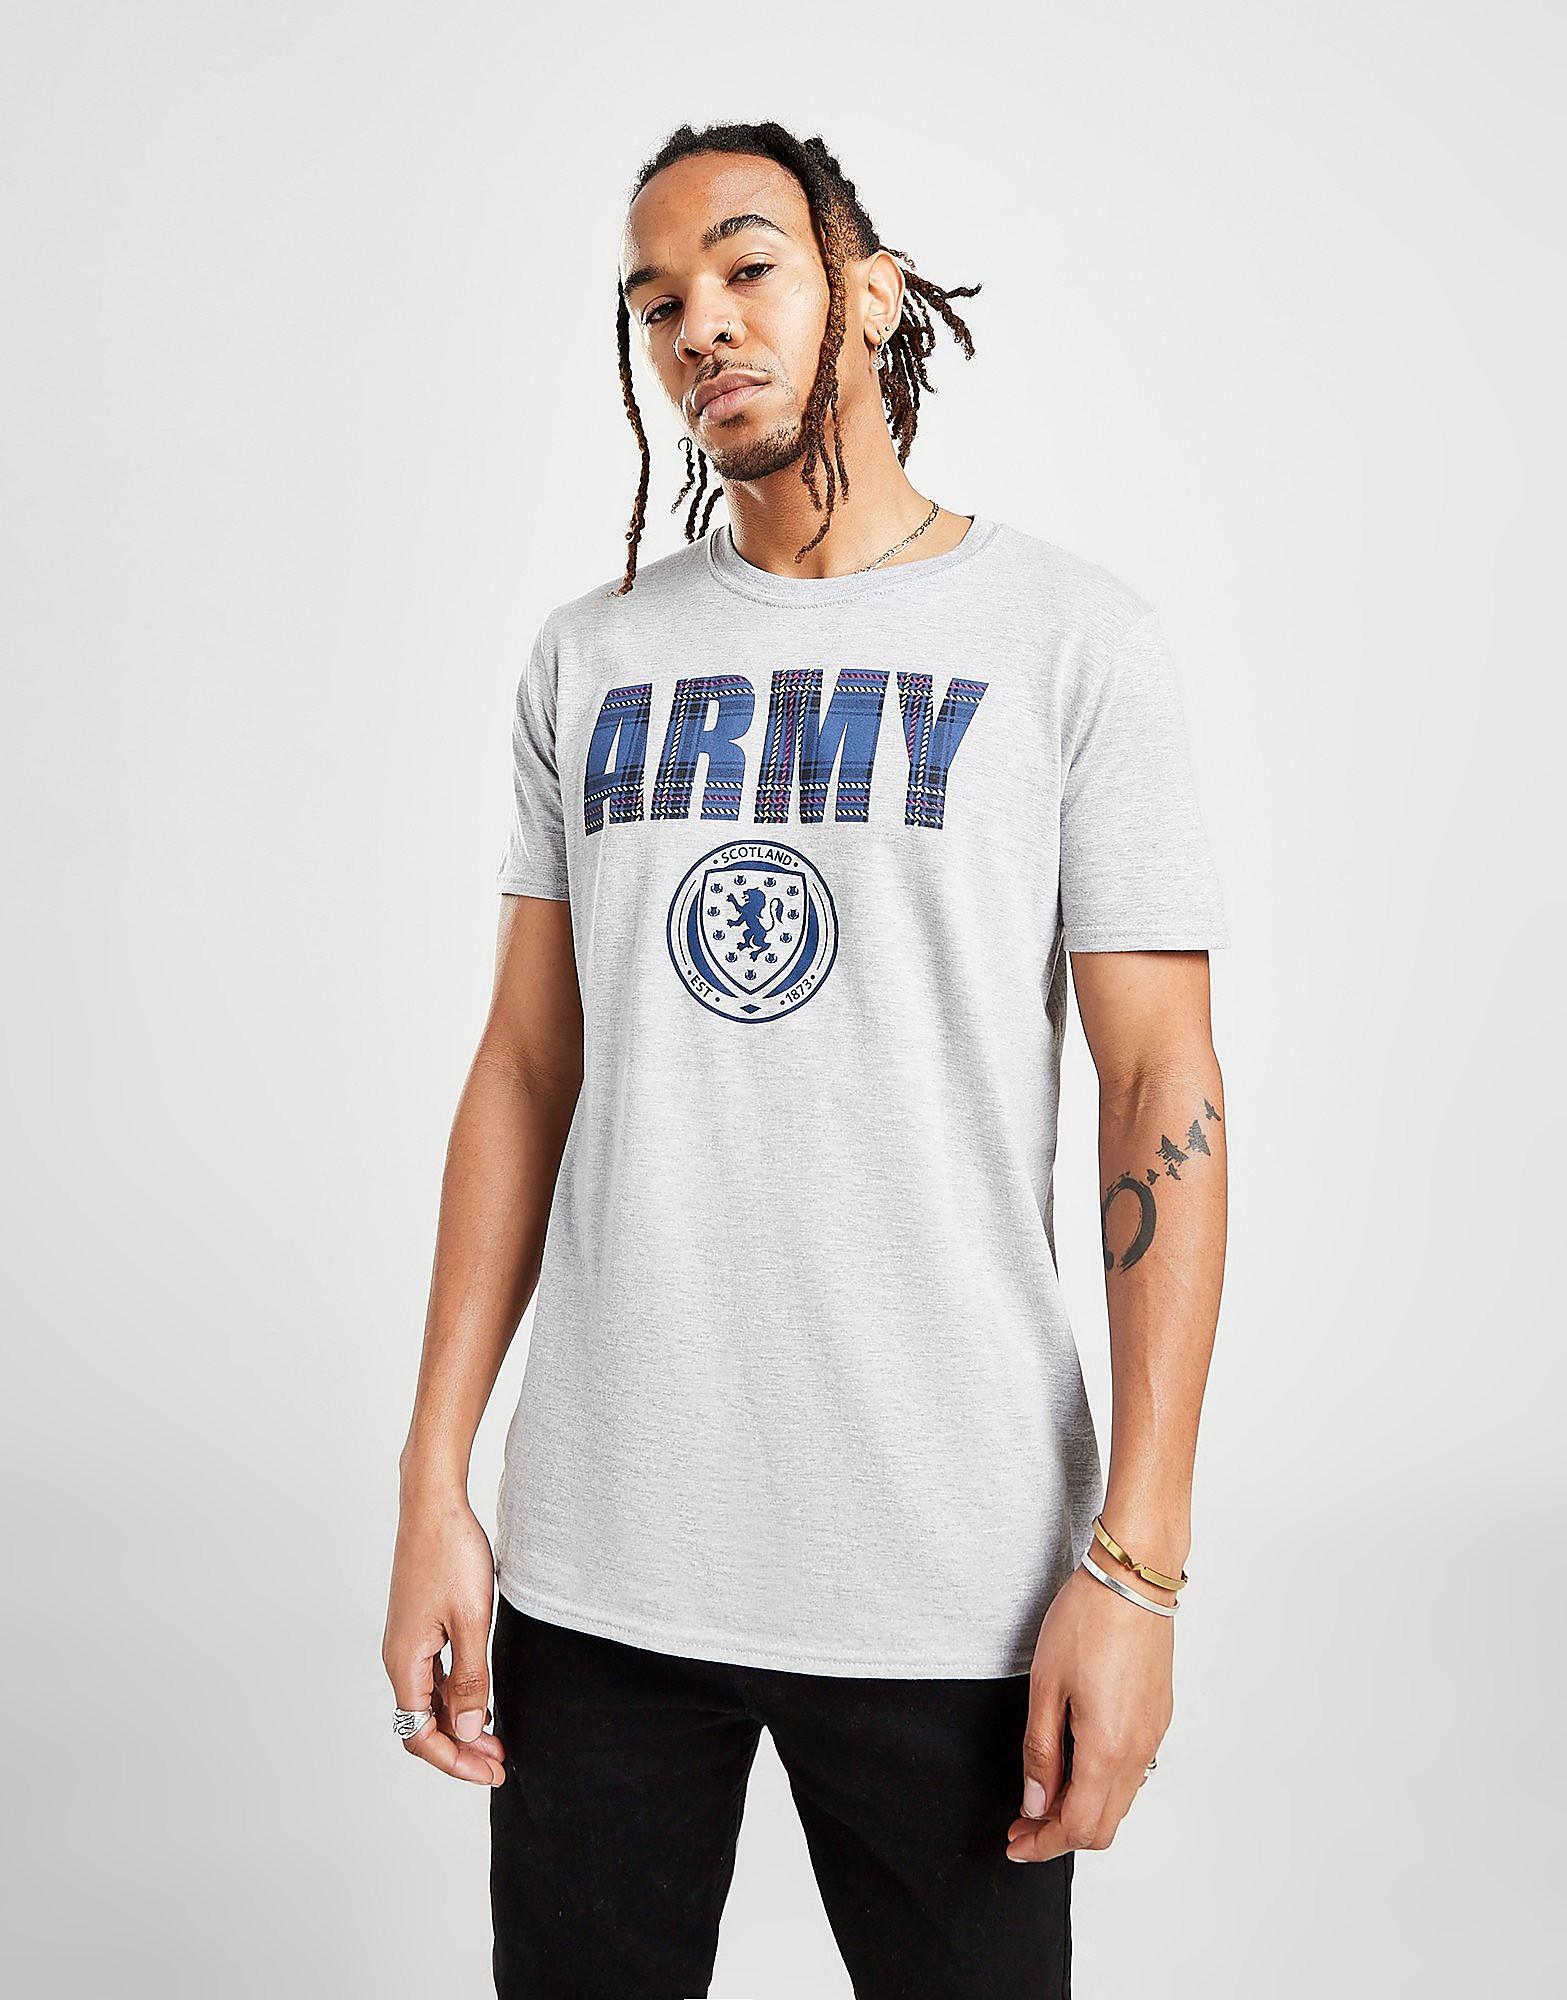 Official Team T-shirt Scotland Army